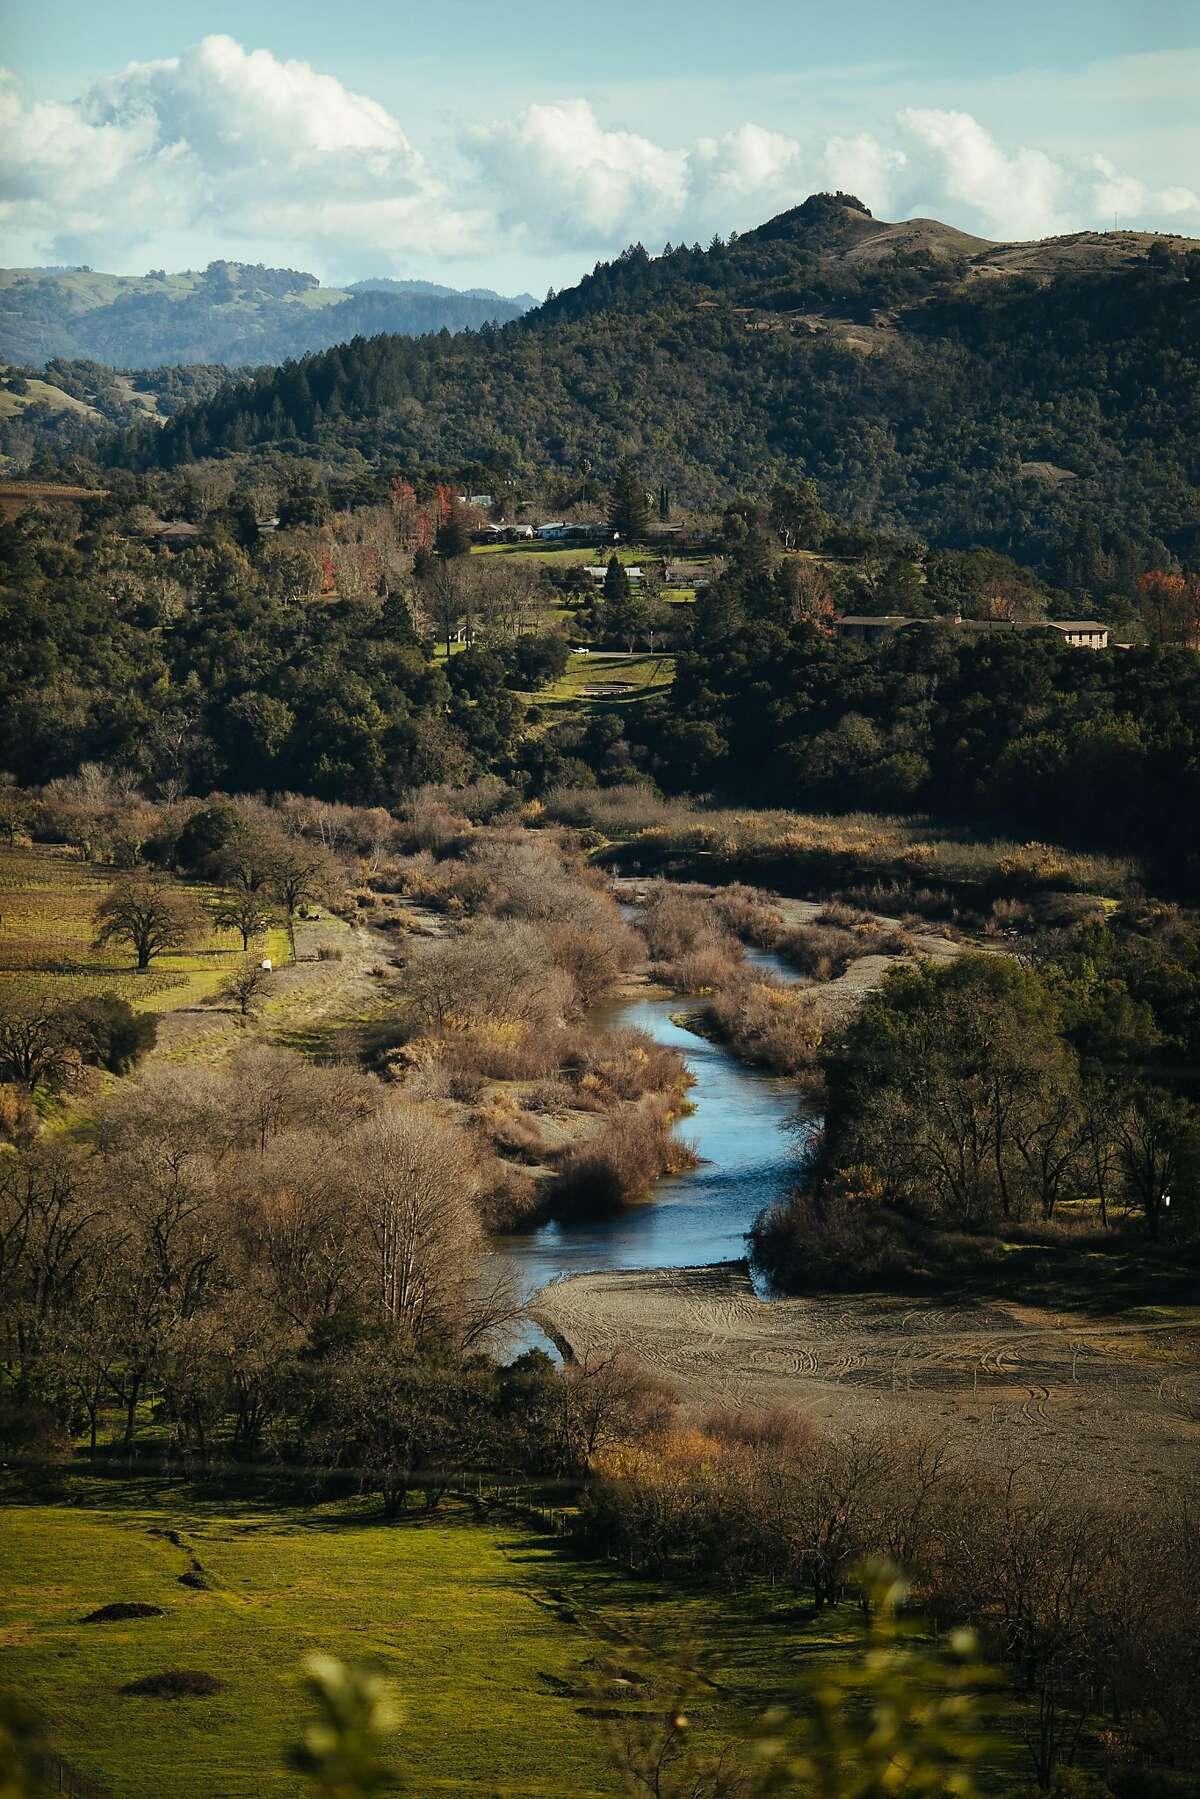 Russian River Overlook seen from the Healdsburg Ridge Open Space Preserve in Healdsburg, Calif. Saturday, Jan. 6, 2018.